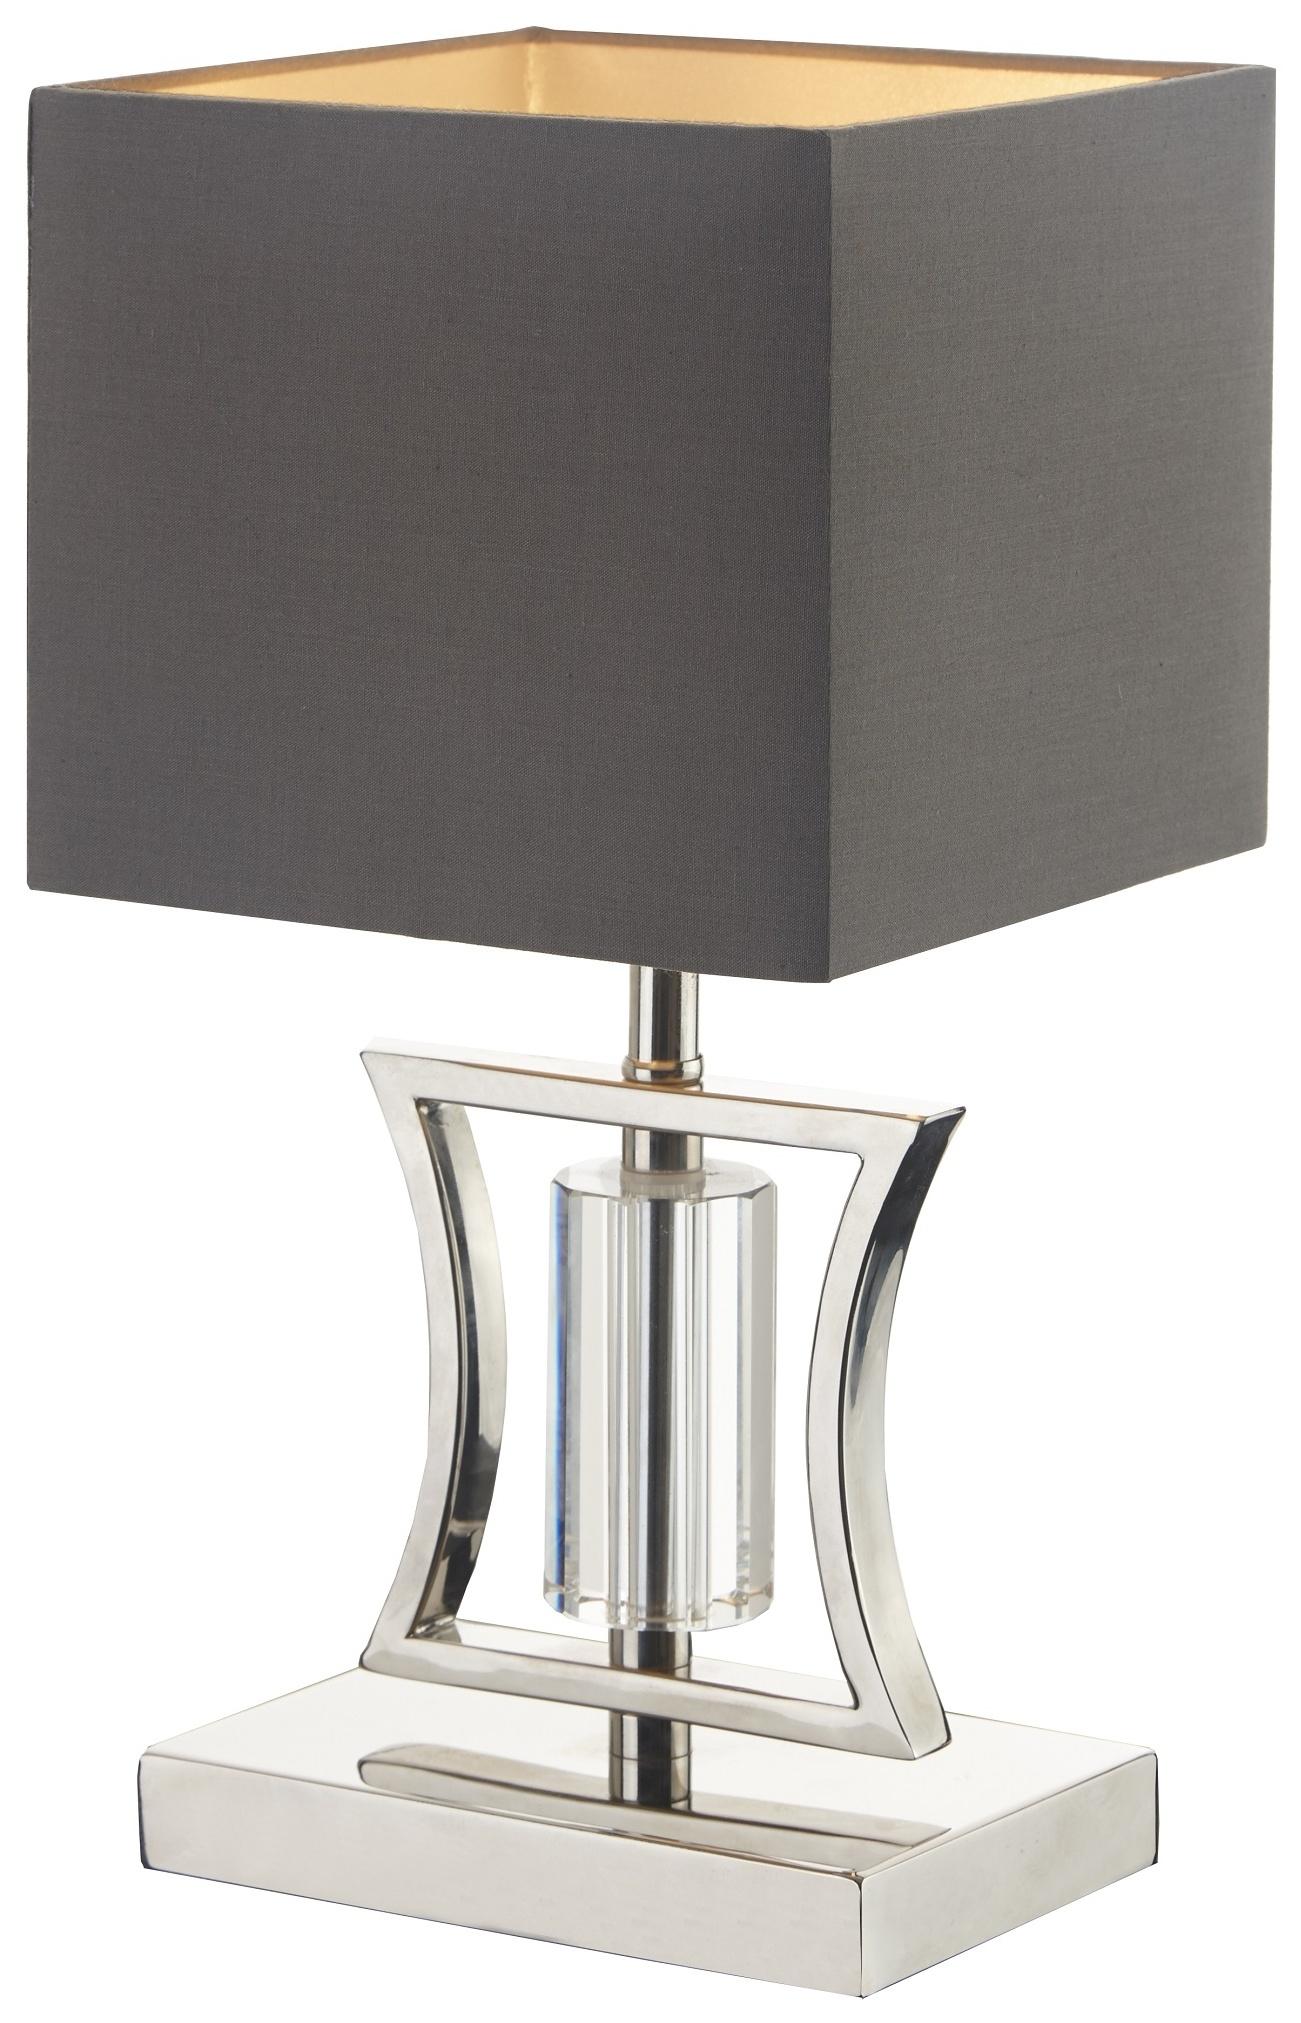 Rv Astley Aberto Table Lamp Satin Nickel And Crystal regarding dimensions 1301 X 2023